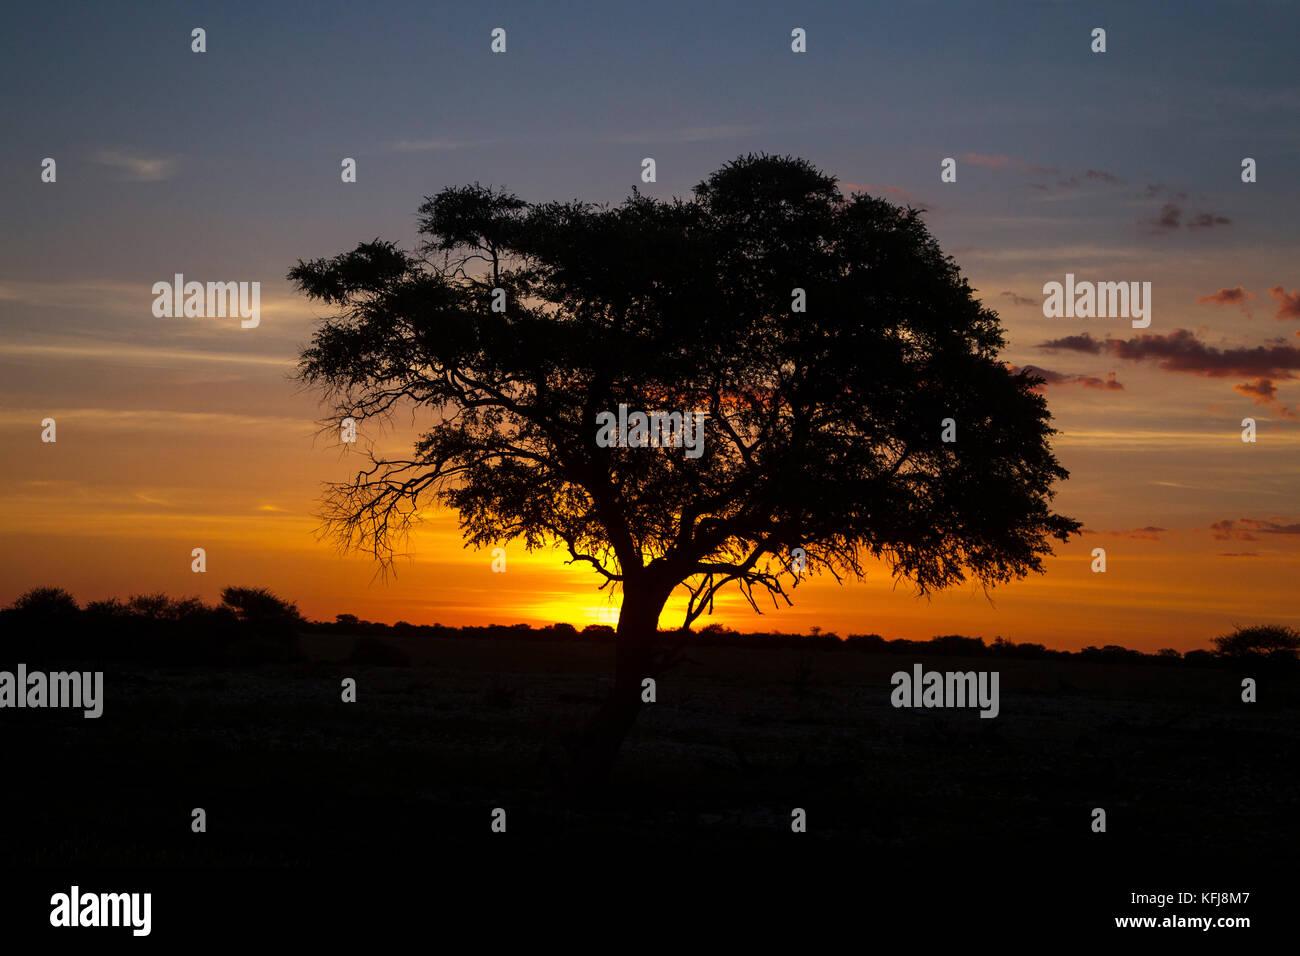 The sun begins to set at the Okaukeujo Waterhole in Etosha National Park on Saturday, Jan. 19, 2013 - Stock Image